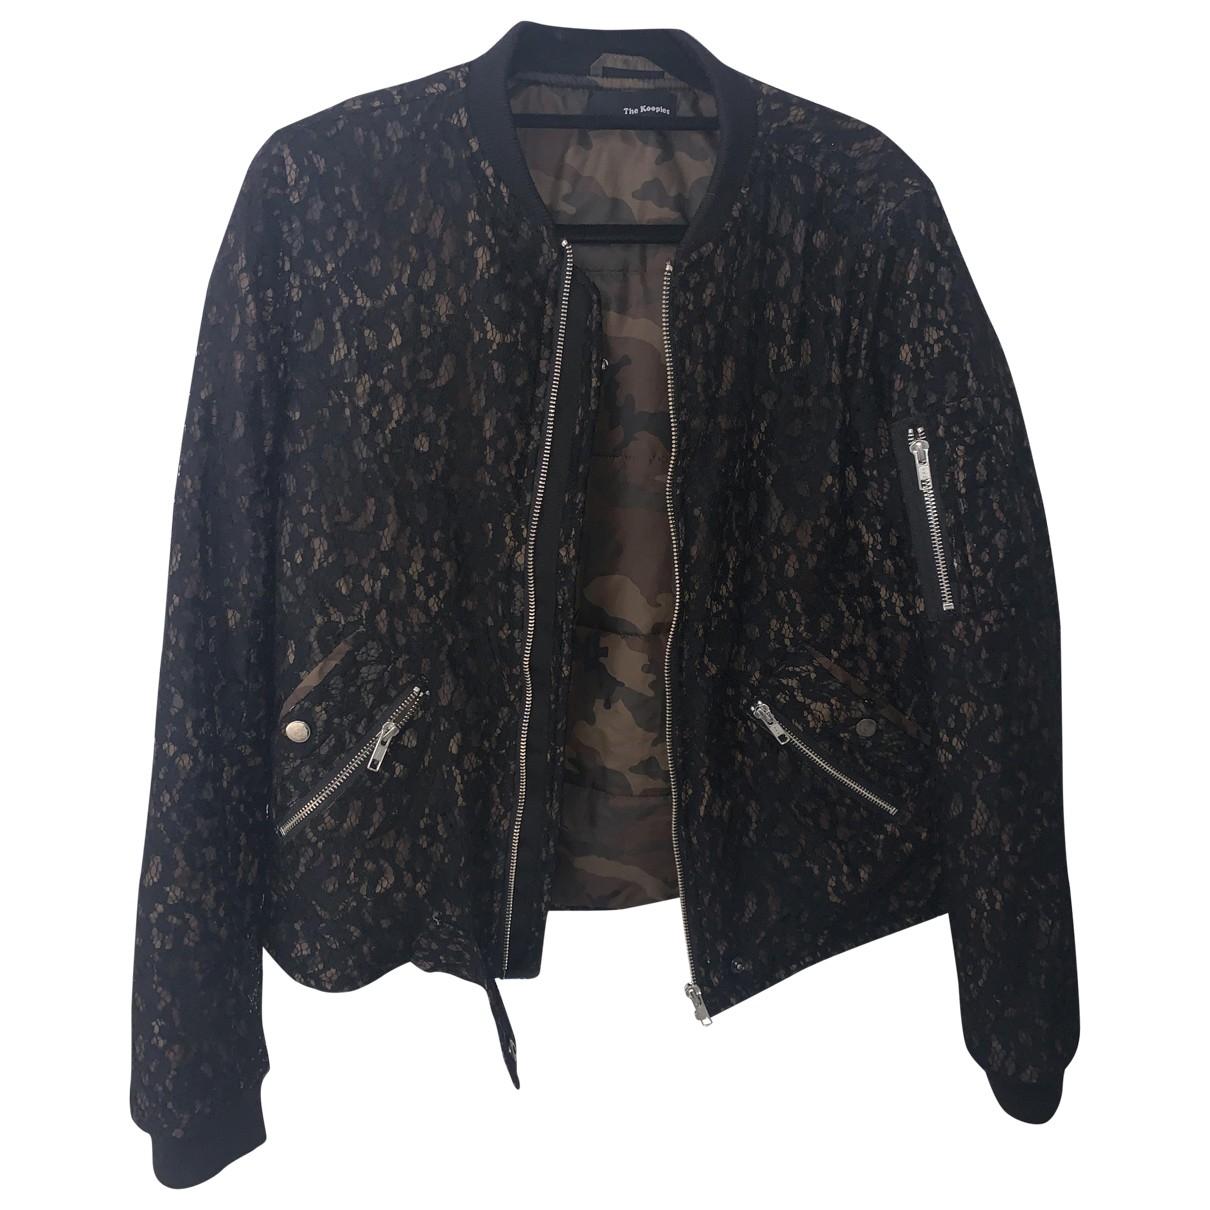 The Kooples \N Black coat for Women M International